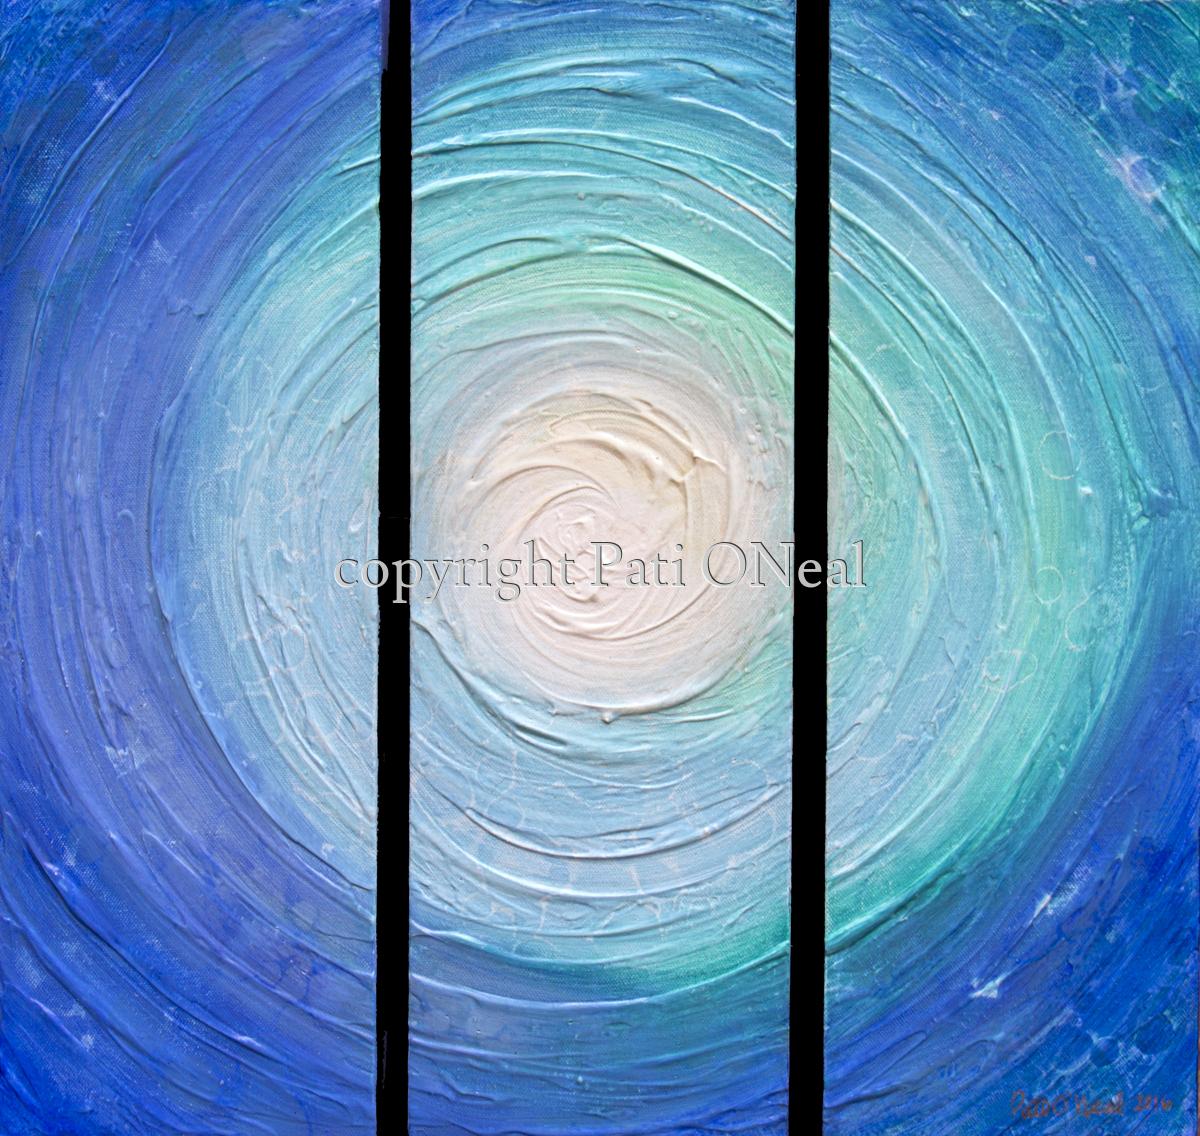 Blue Swirl (large view)